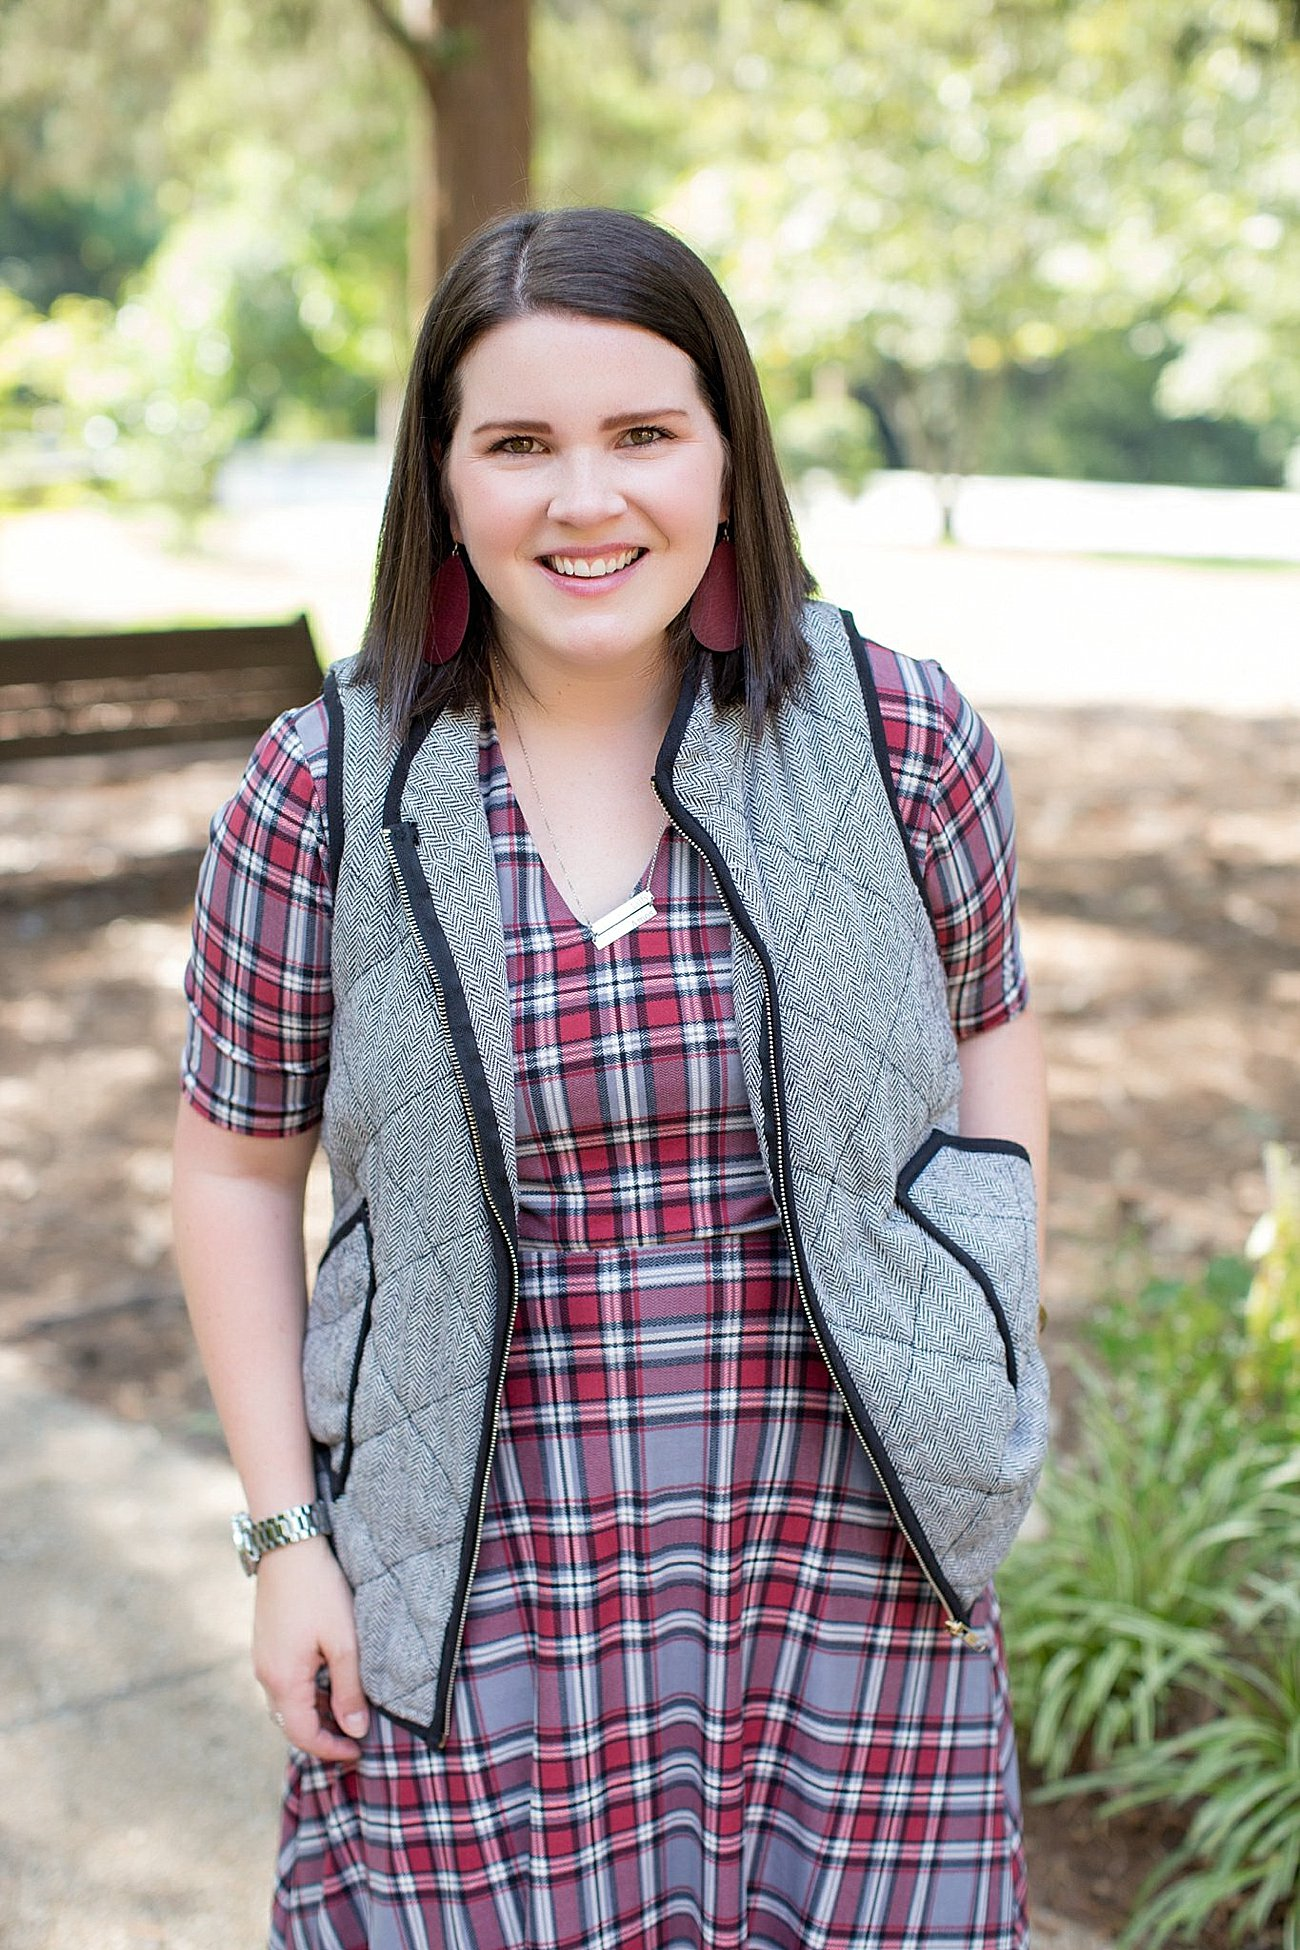 Agnes & Dora plaid Austen dress, herringbone vest, fall fashion, ethical fall fashion | North Carolina life and style blogger (6)